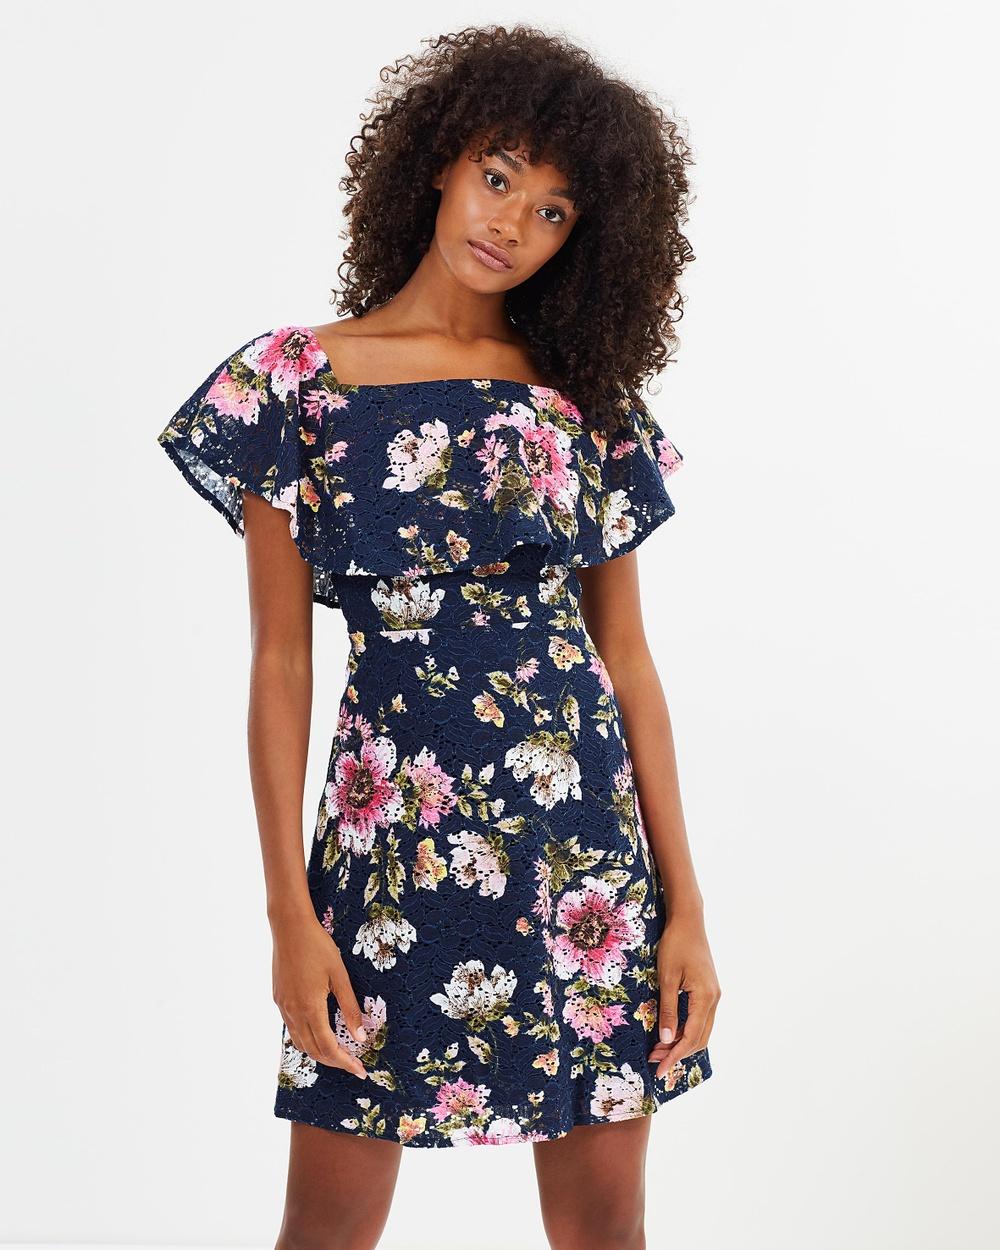 Warehouse Floral Lace Bardot Dress Dresses Navy Floral Lace Bardot Dress